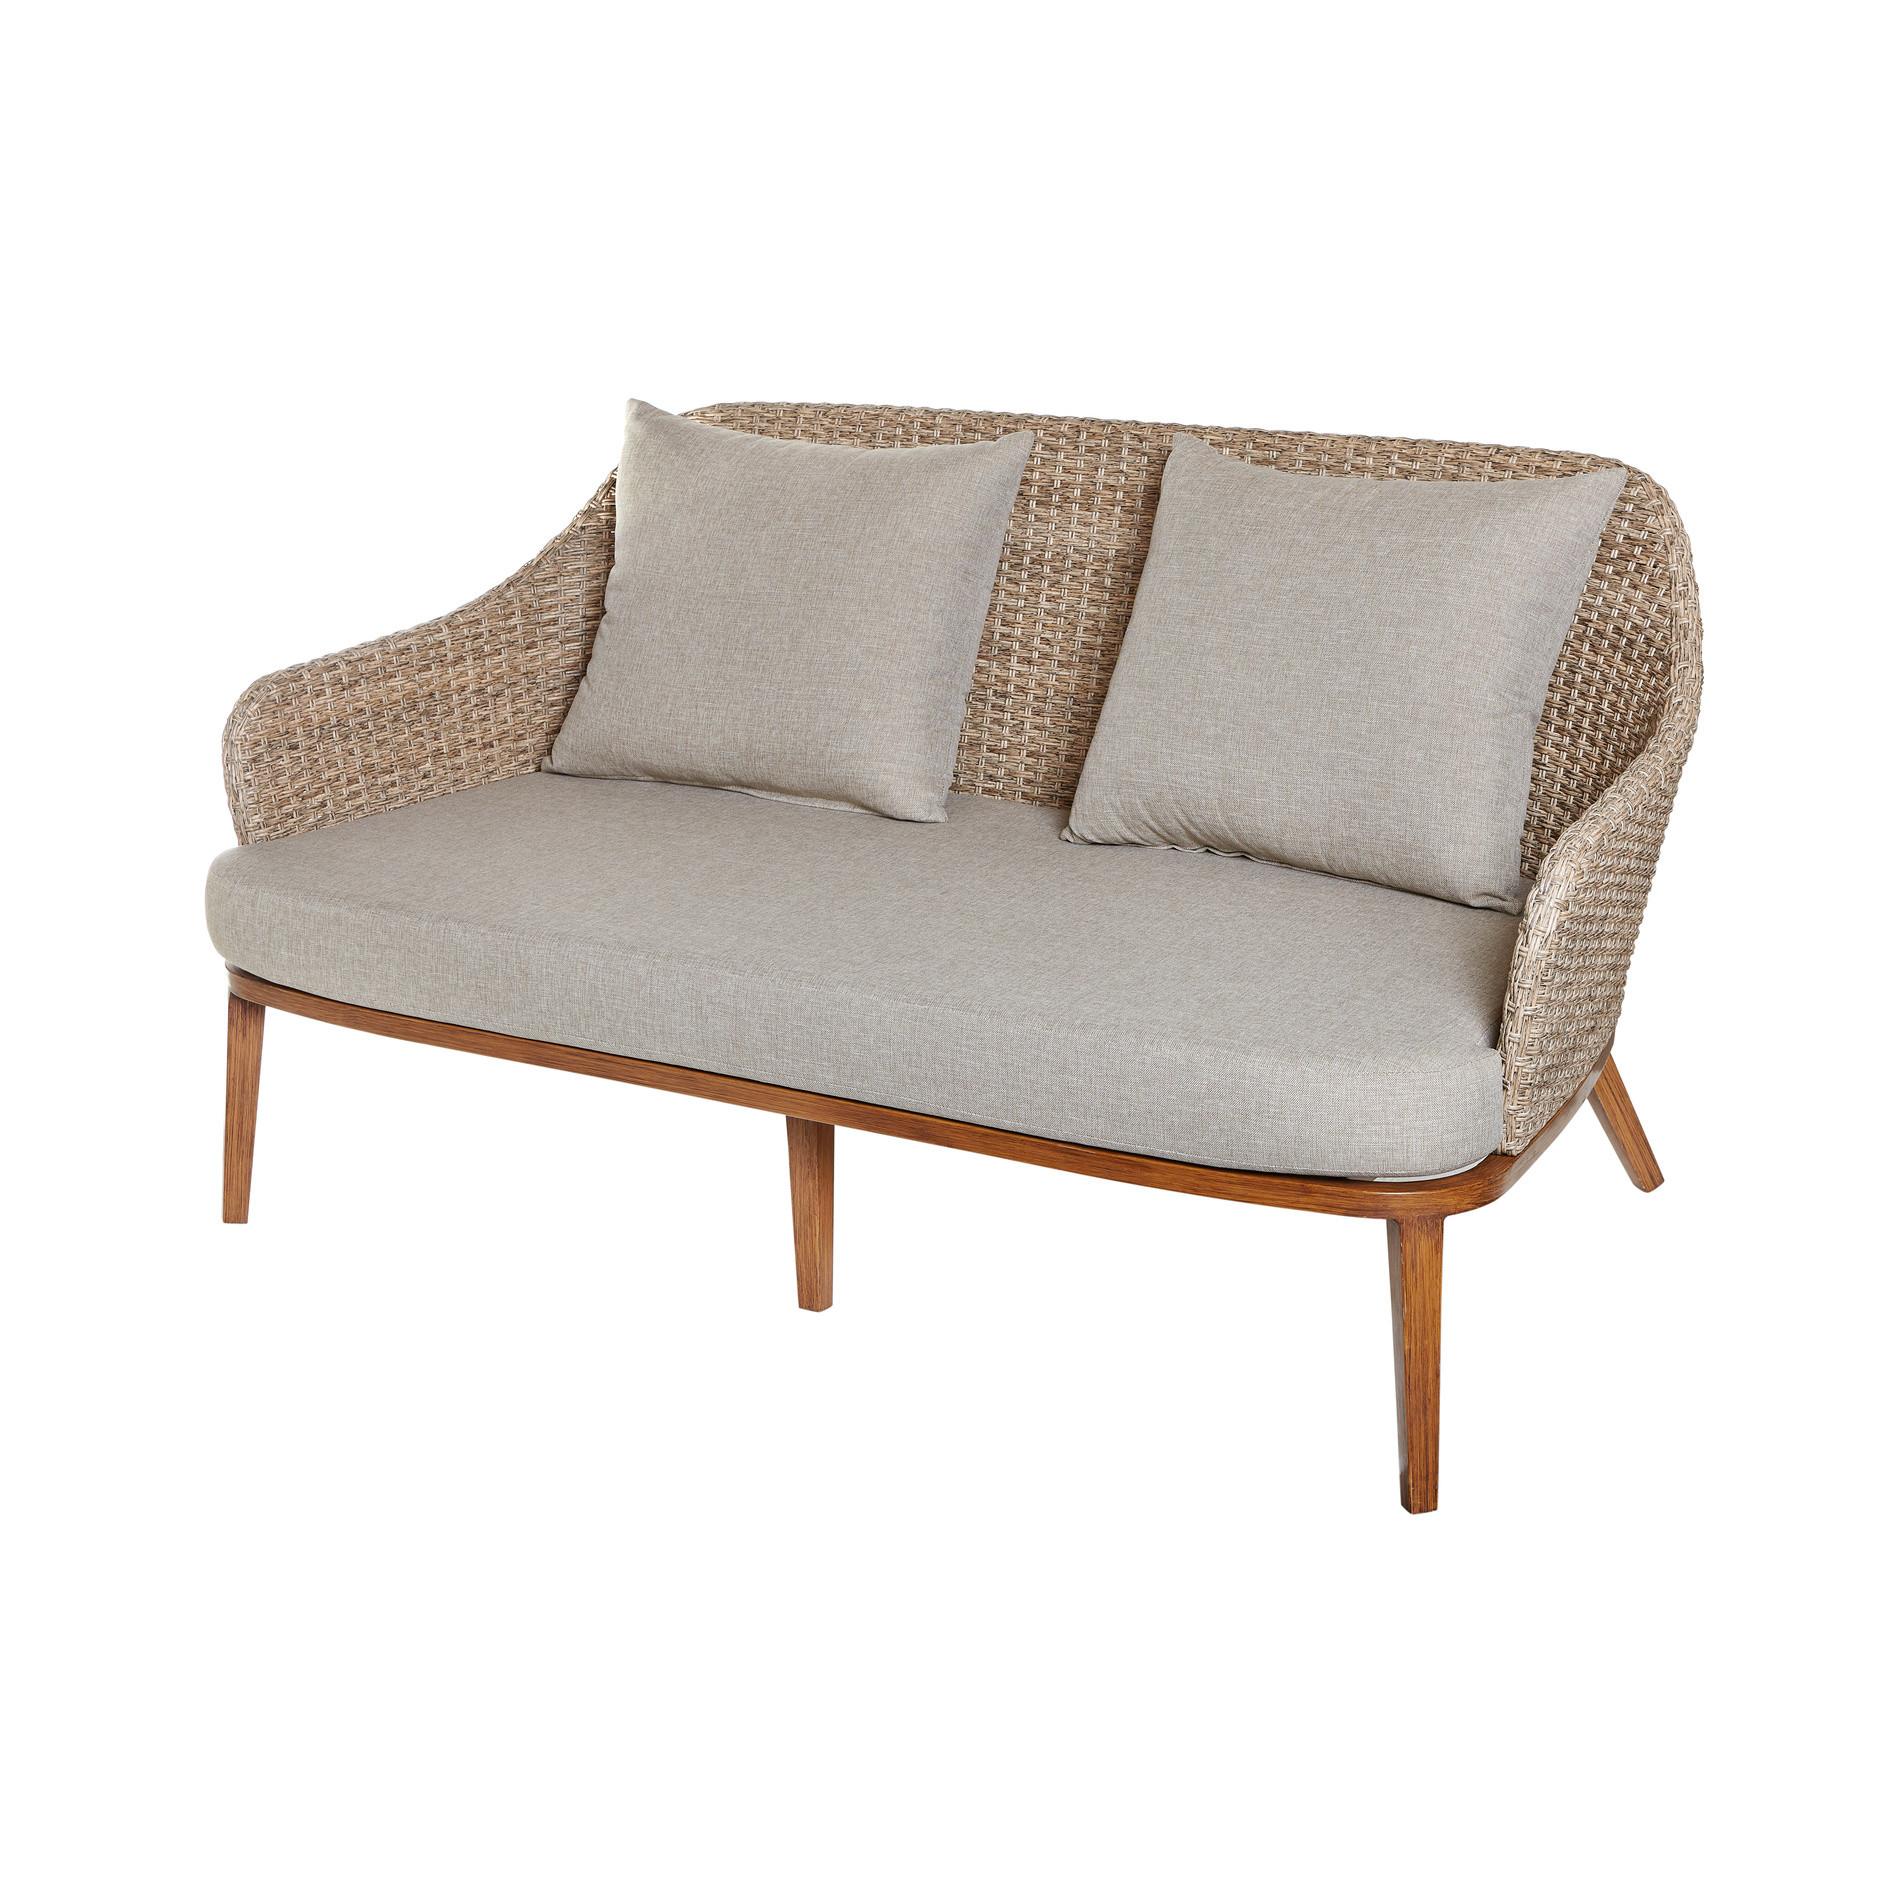 Small Outdoor Baltic Sofa In Polyrattan